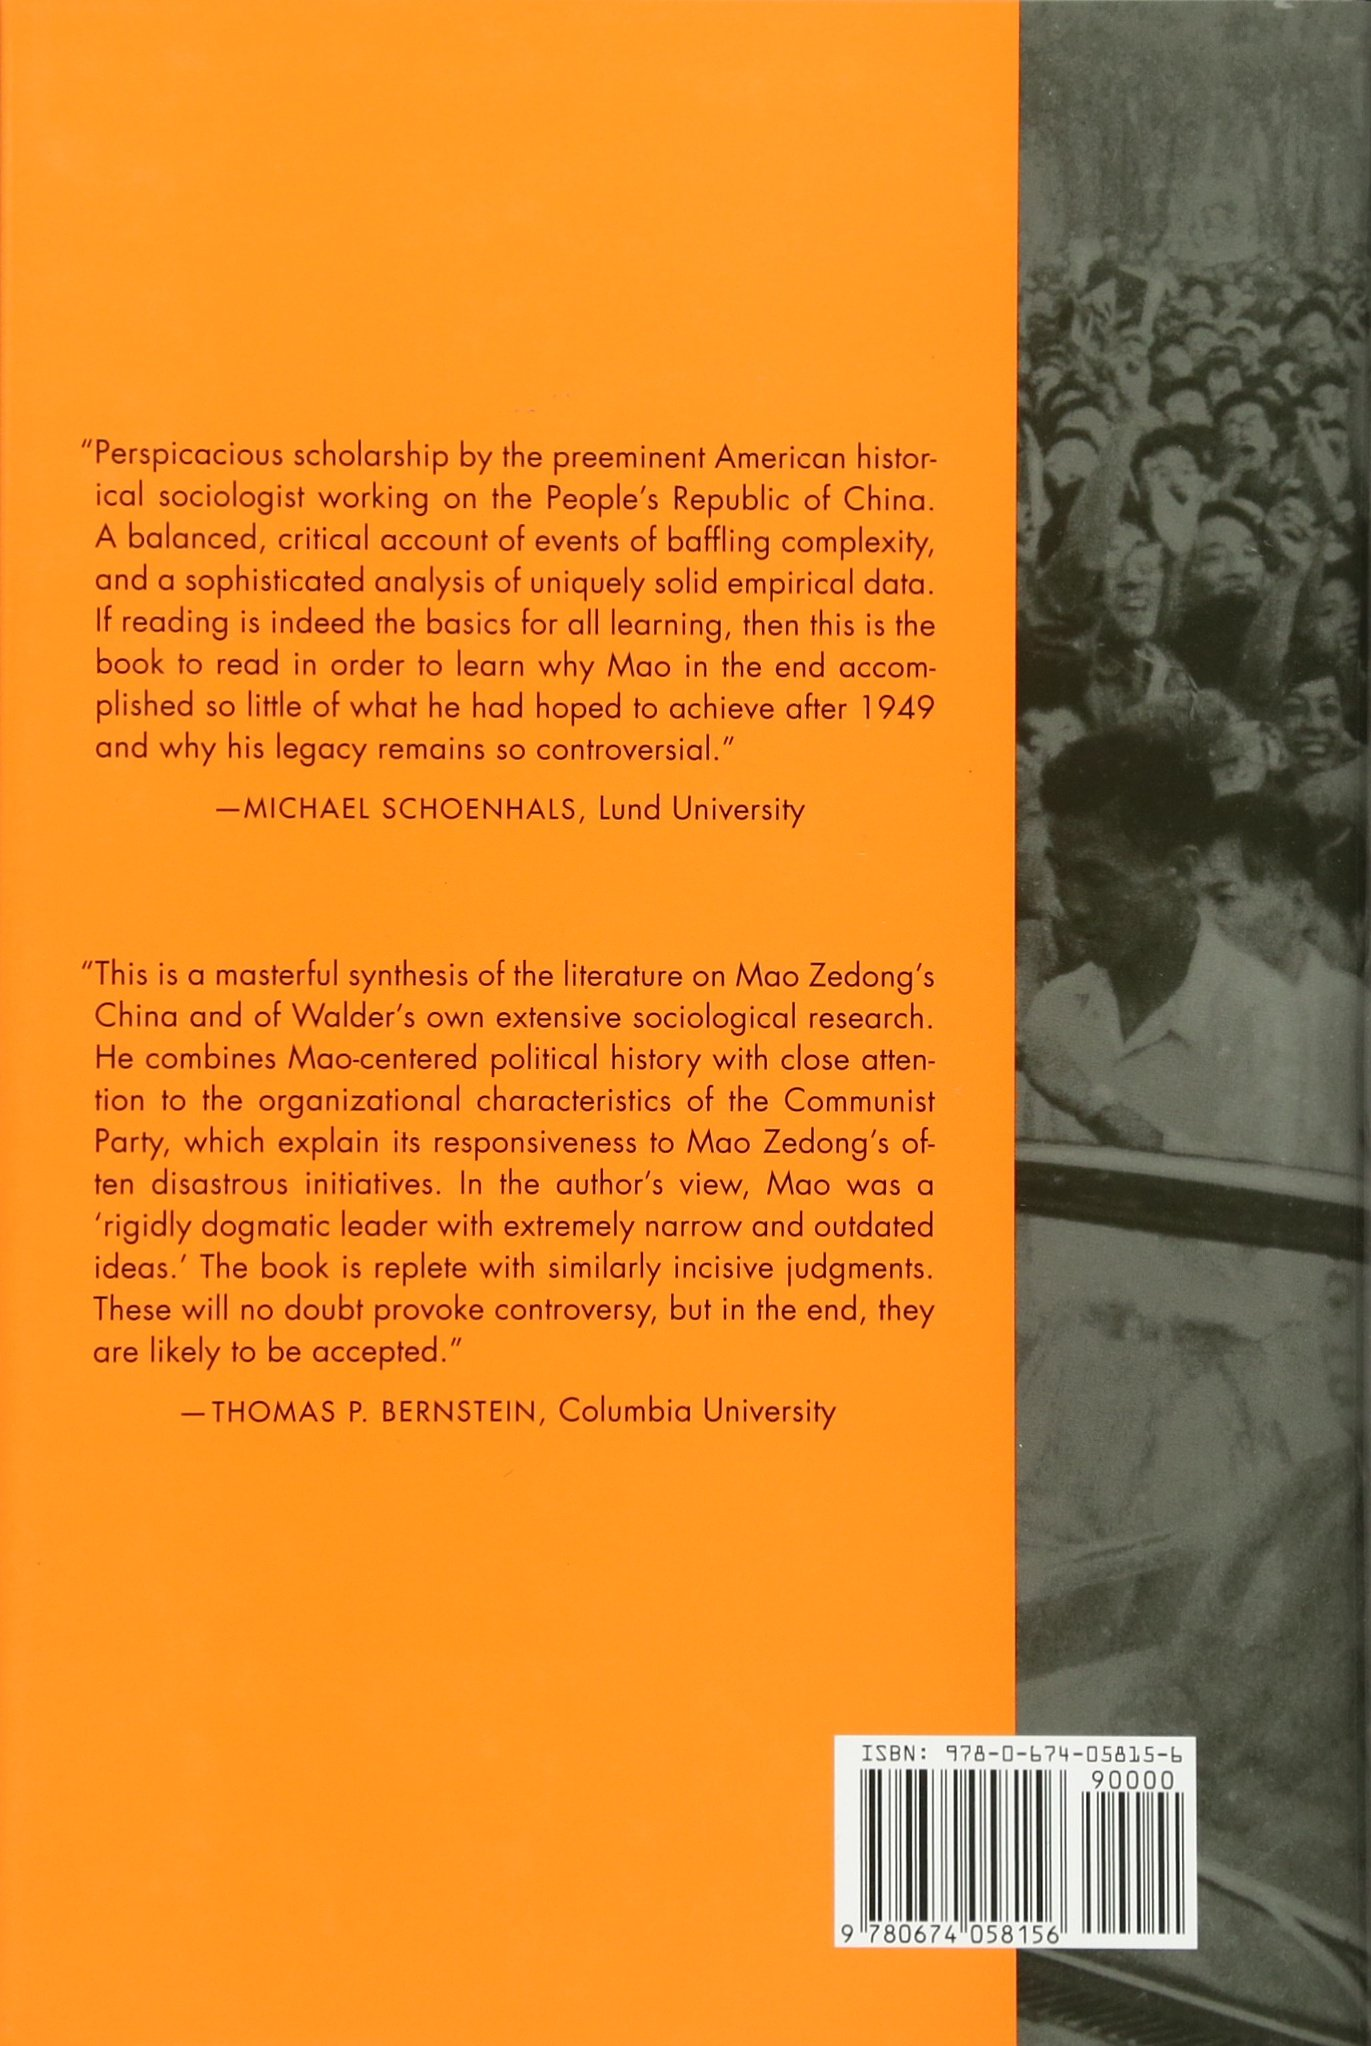 China Under Mao: A Revolution Derailed: Andrew G Walder: 9780674058156:  Amazon: Books